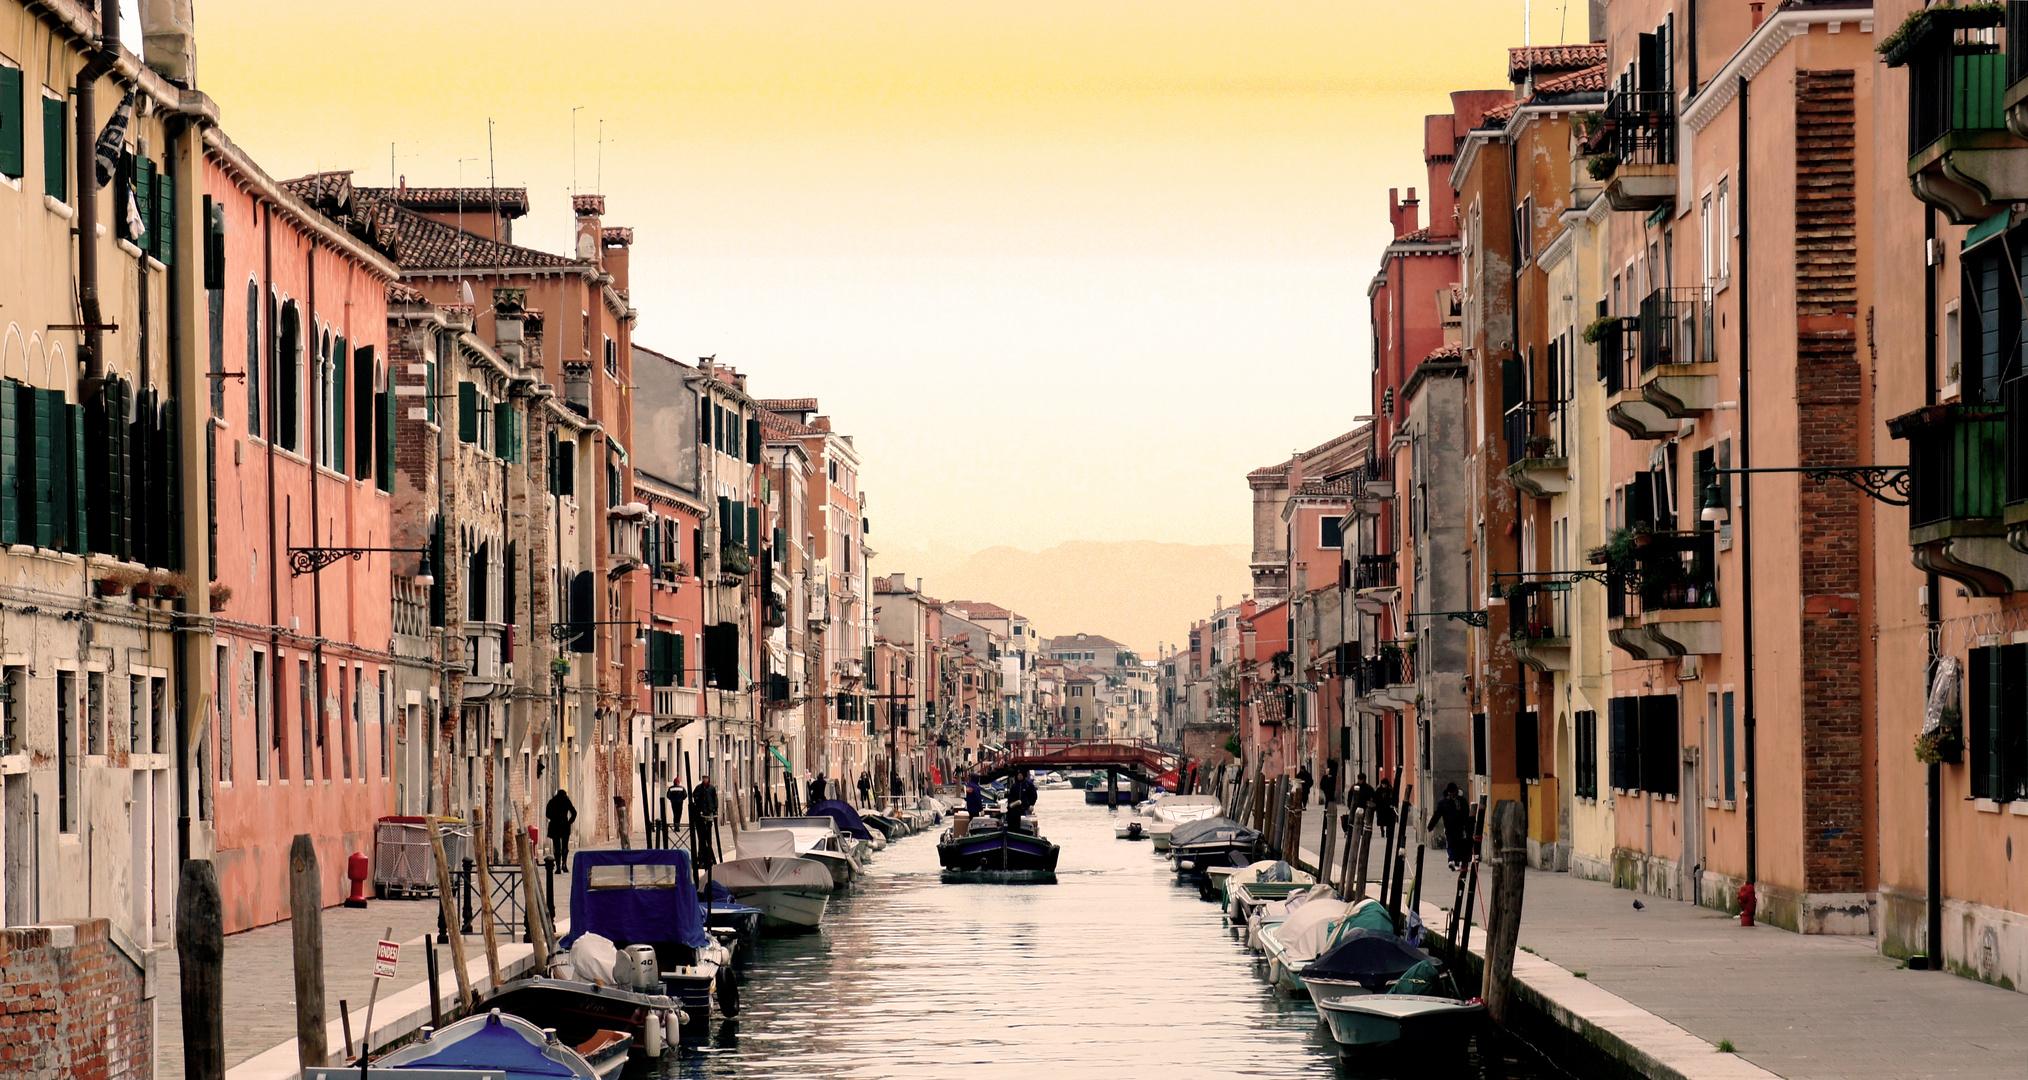 Couleurs de Venise - Cannaregio 1